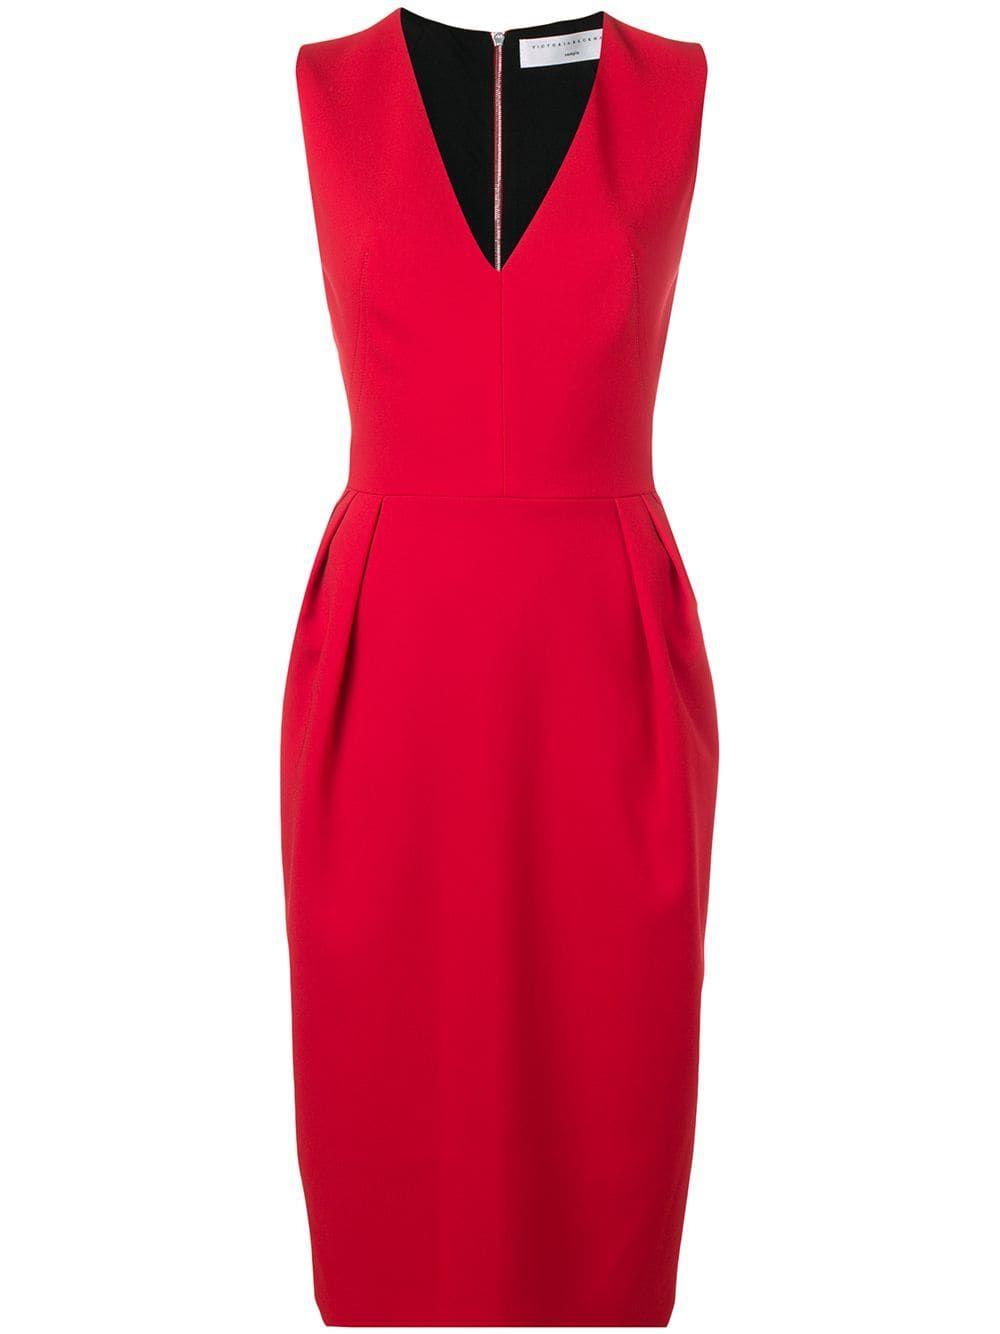 Victoria Beckham Sleeveless V Neck Sheath Dress In Red Modesens Victoria Beckham Dress Dresses Victoria Beckham [ 1334 x 1000 Pixel ]